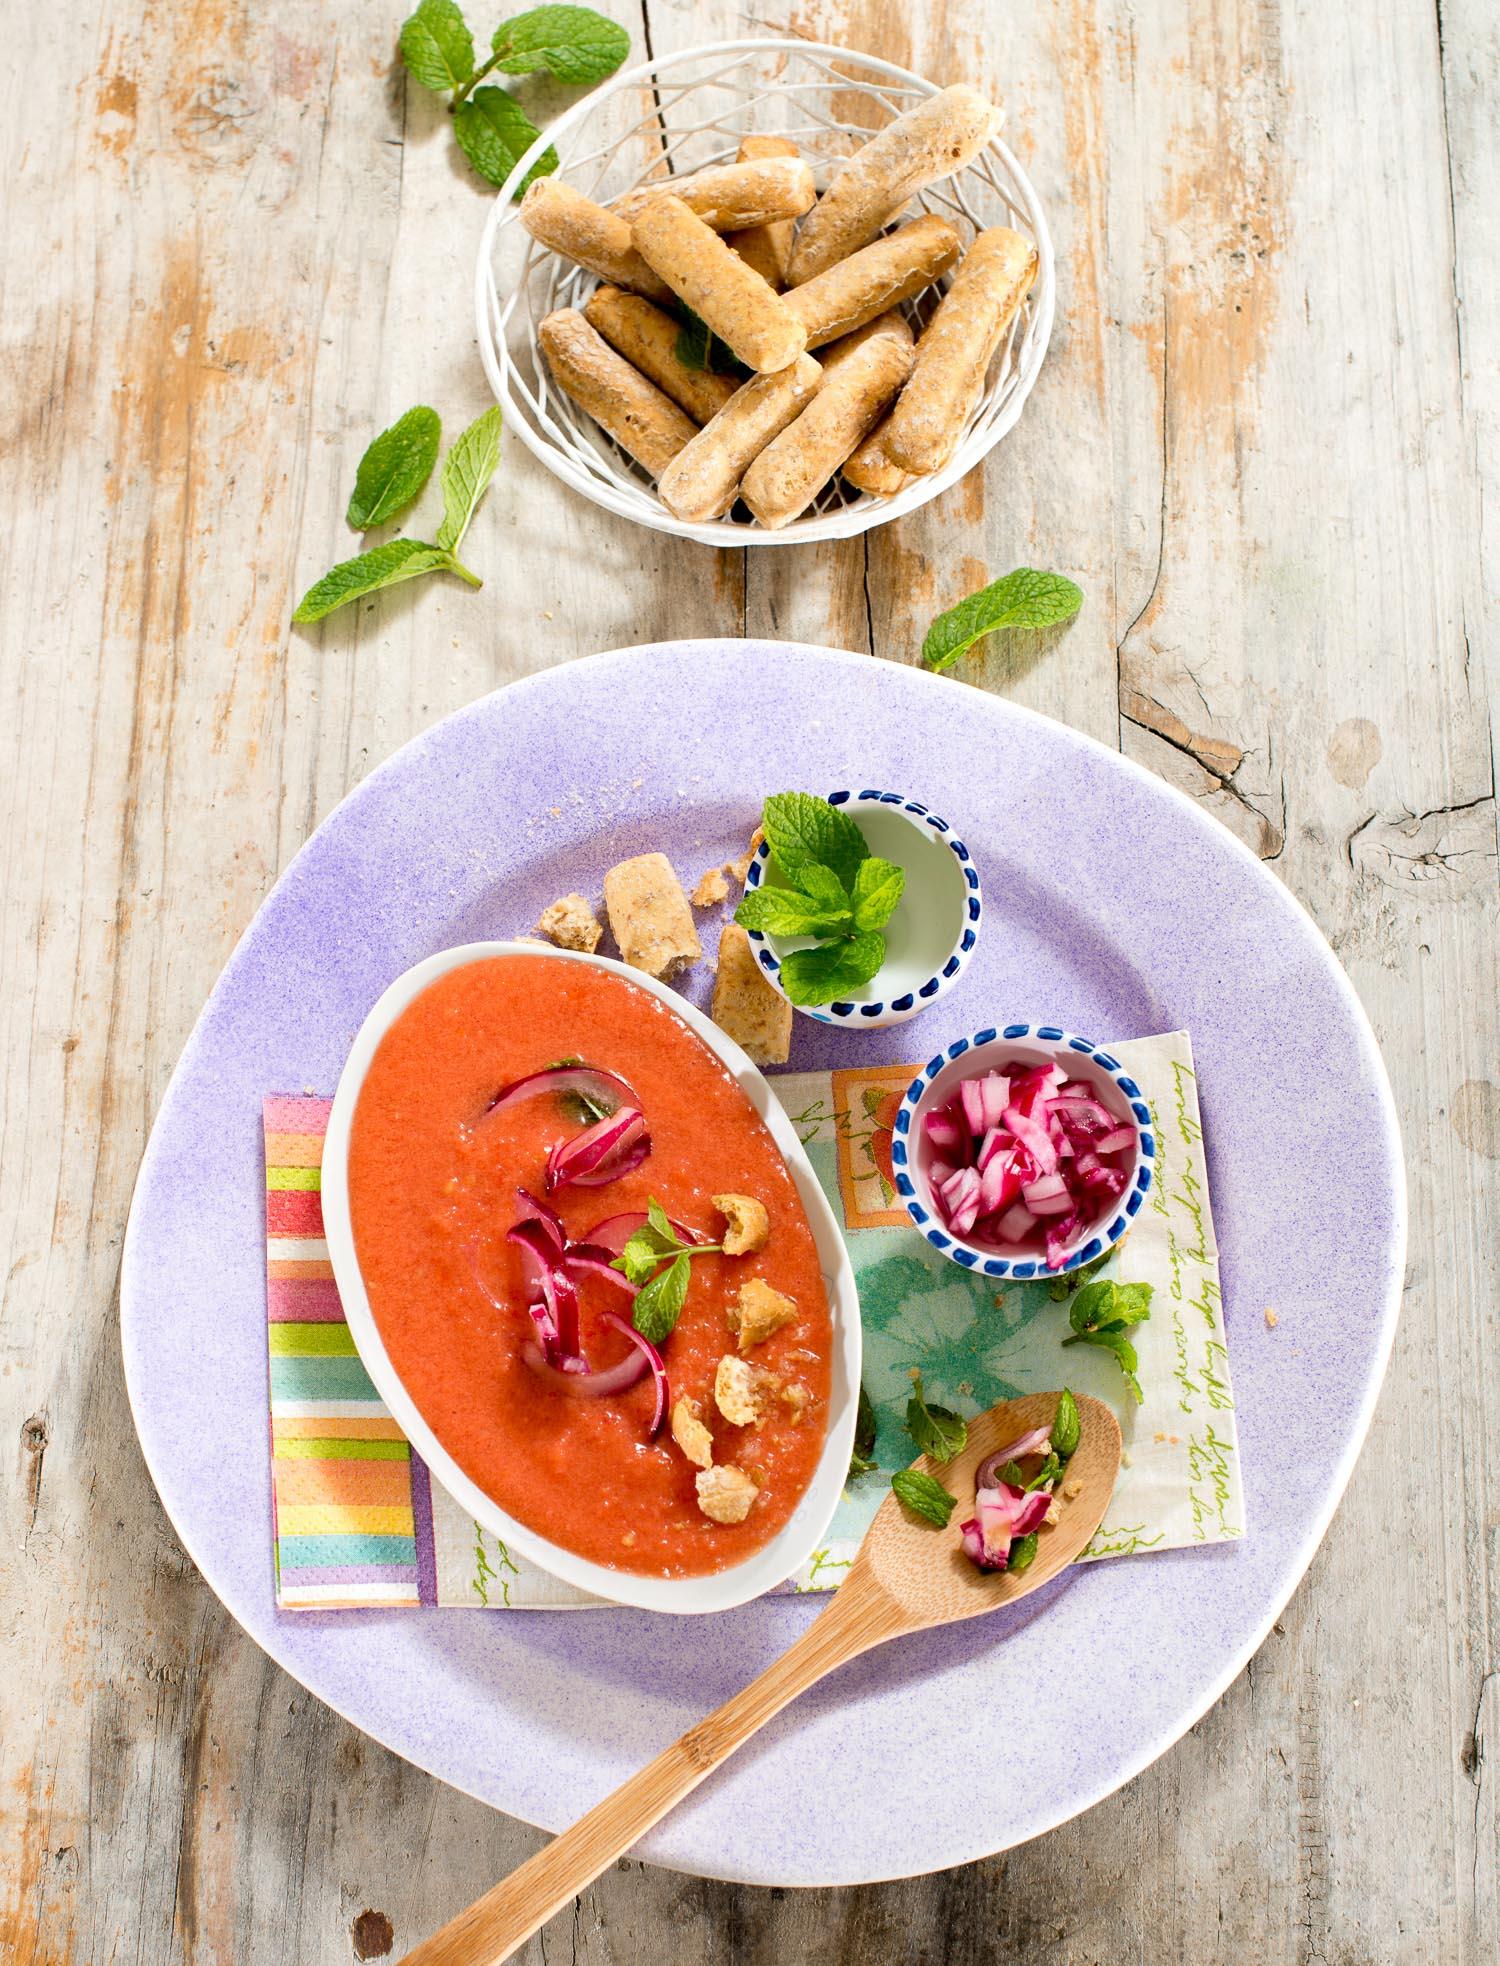 03367 Gazpacho de tomate y sandia.jpg